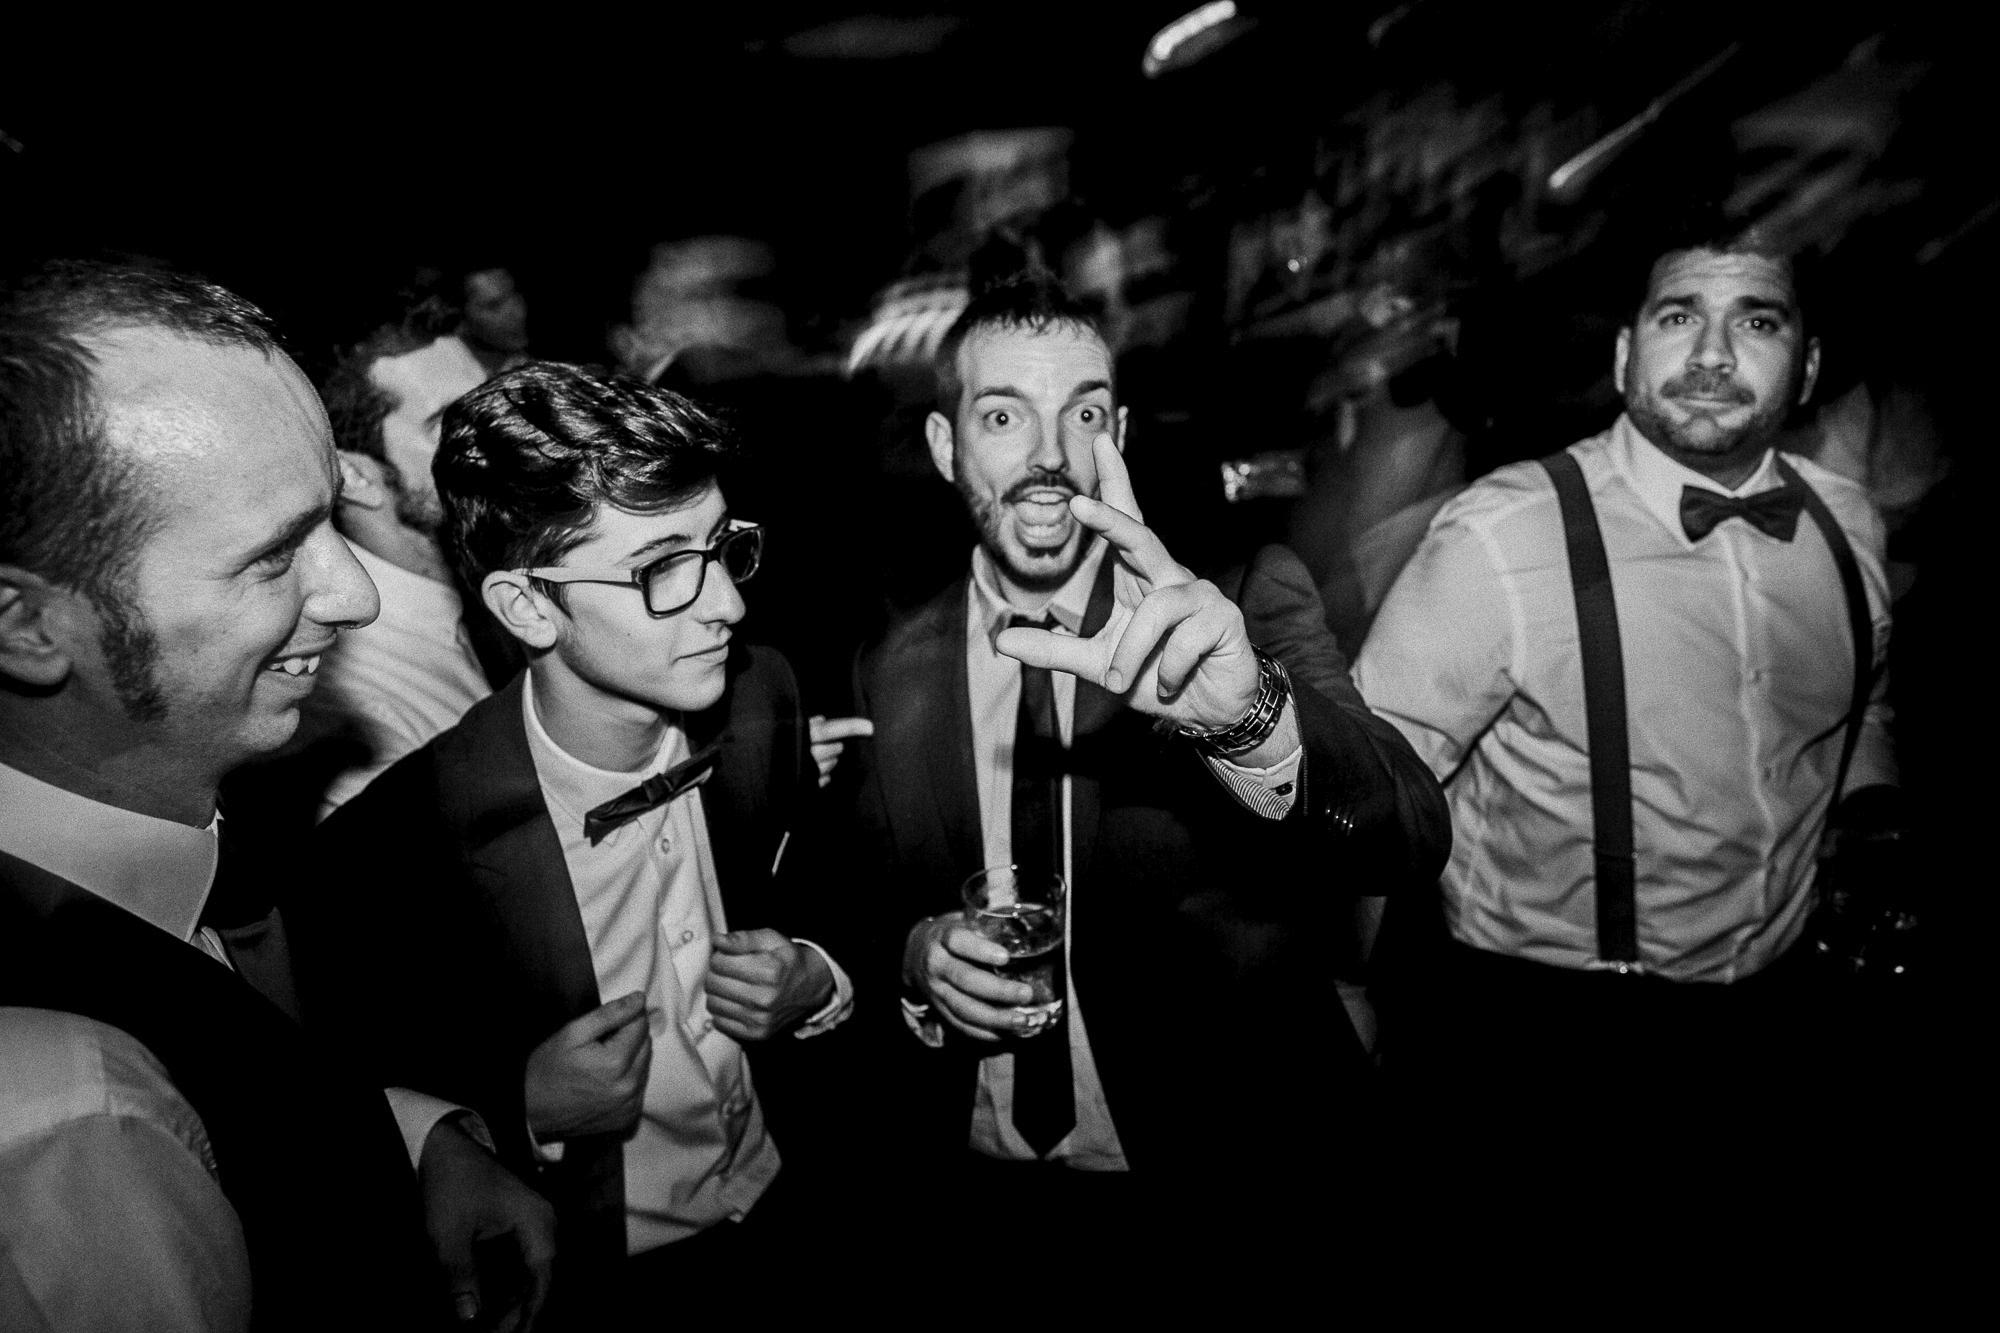 alfonso_flores_destination_wedding_photogrpaher_españa-165.jpg